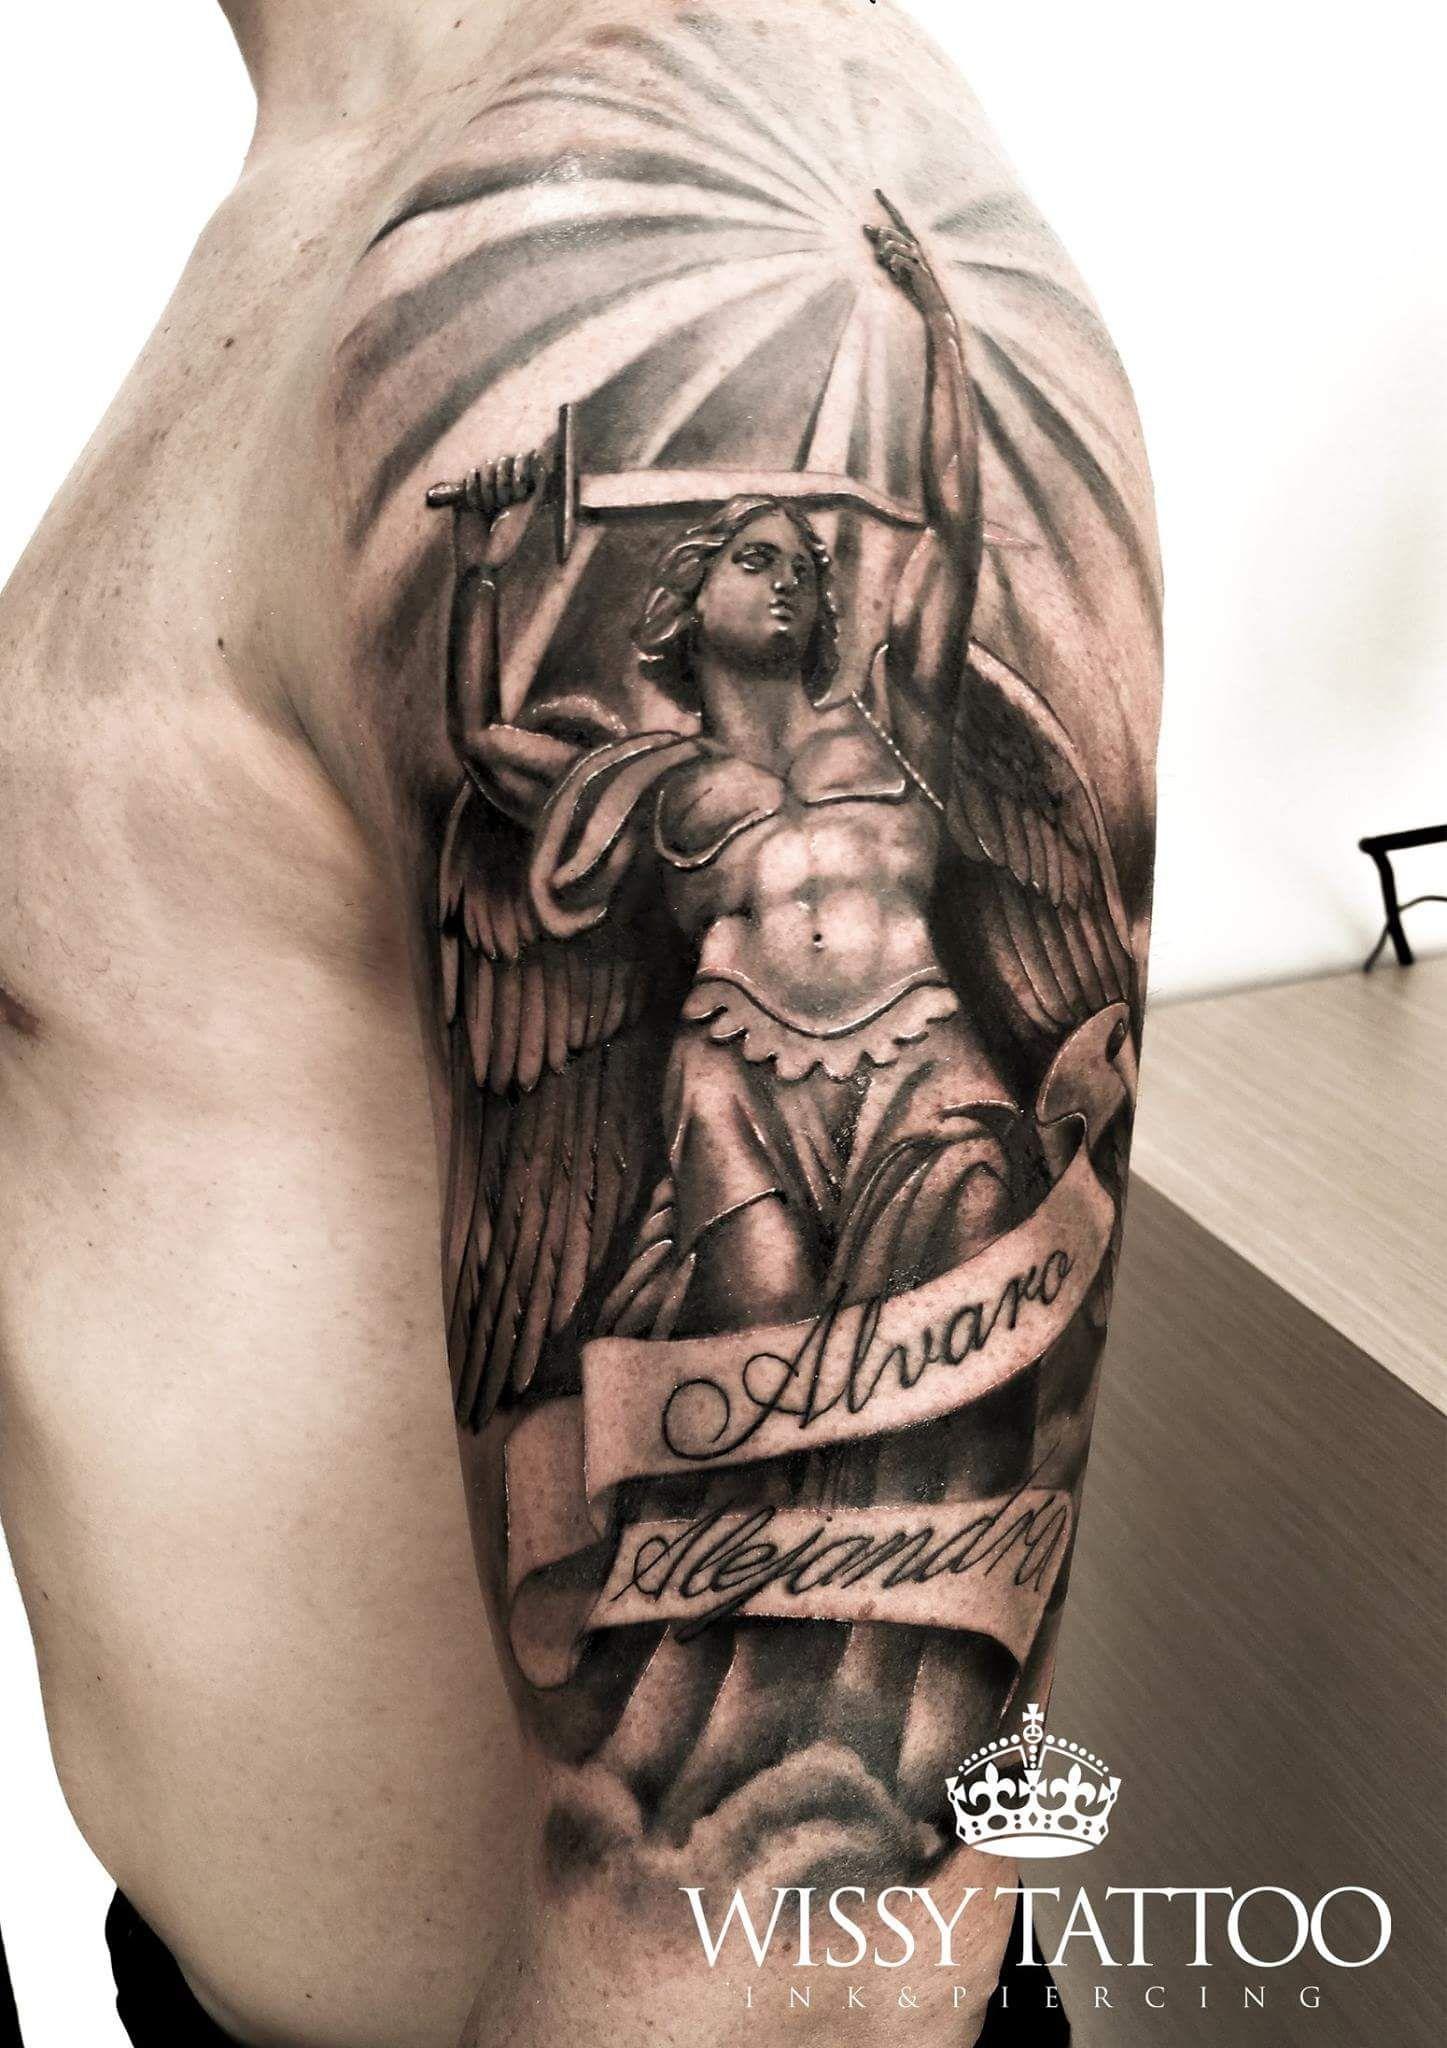 Wissy Tattoo Manulopez Policianacional Police Sanmiguel